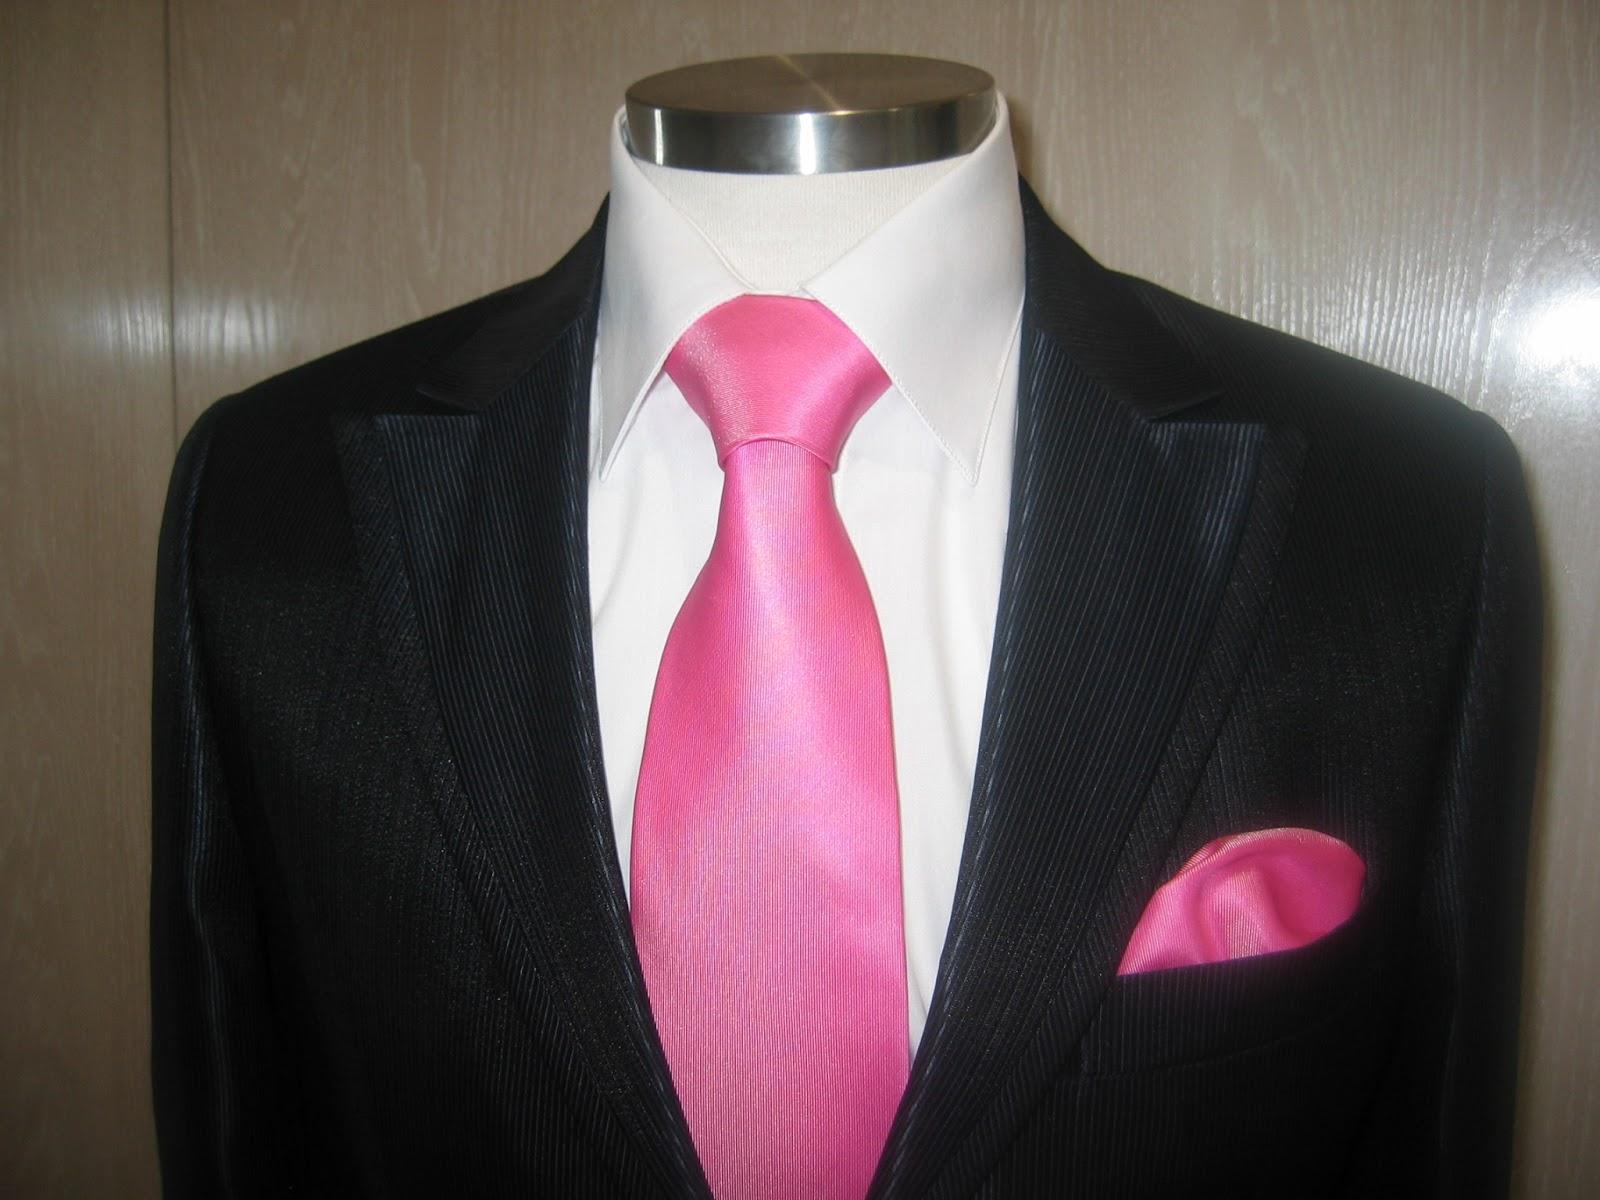 Como hacer nudo de corbata windsor impecable paso a paso for Nudo de corbata windsor